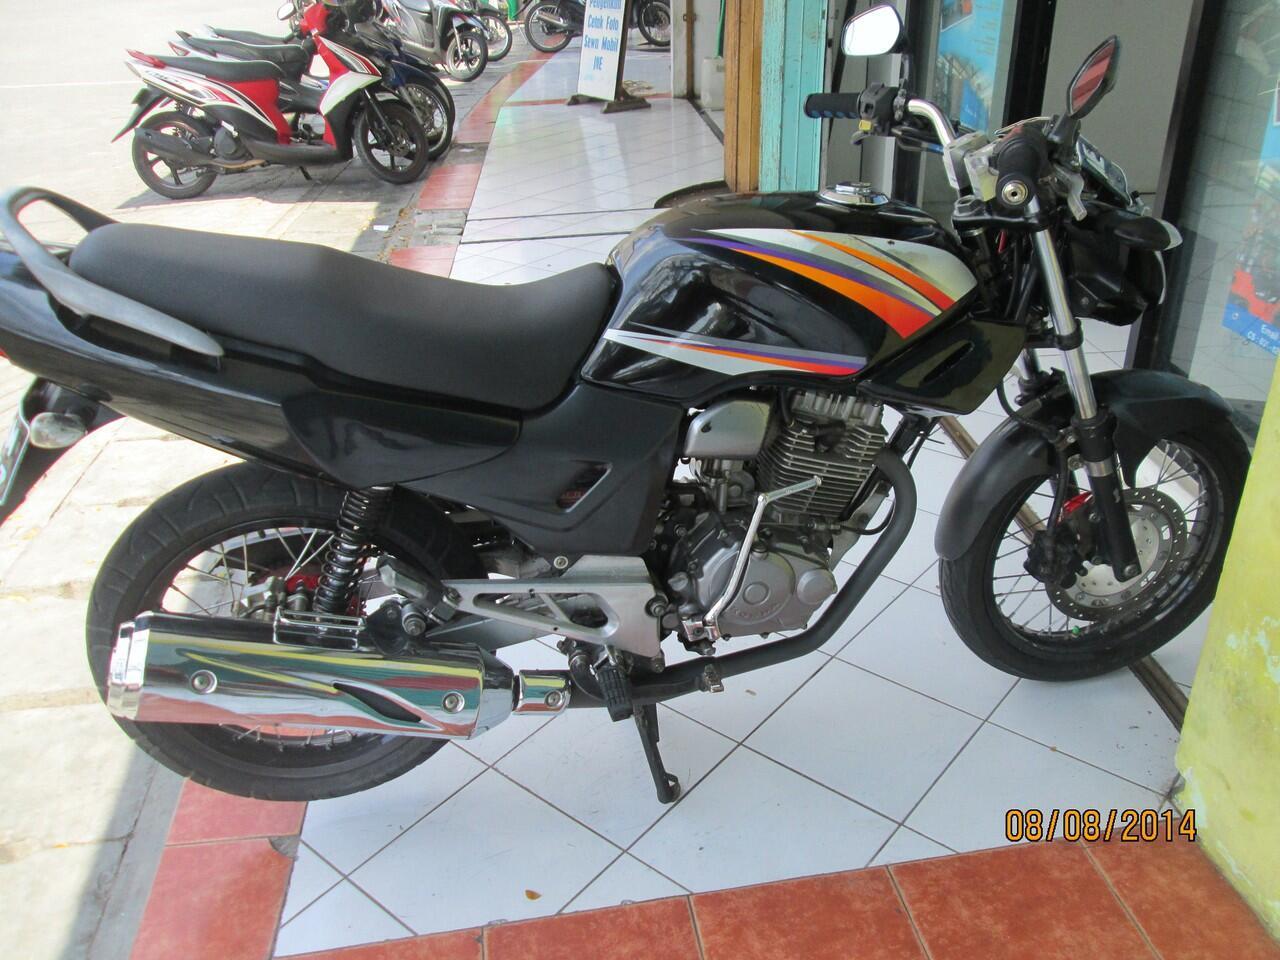 Terjual Tiger 2000 Ae Ponorogo Kaskus